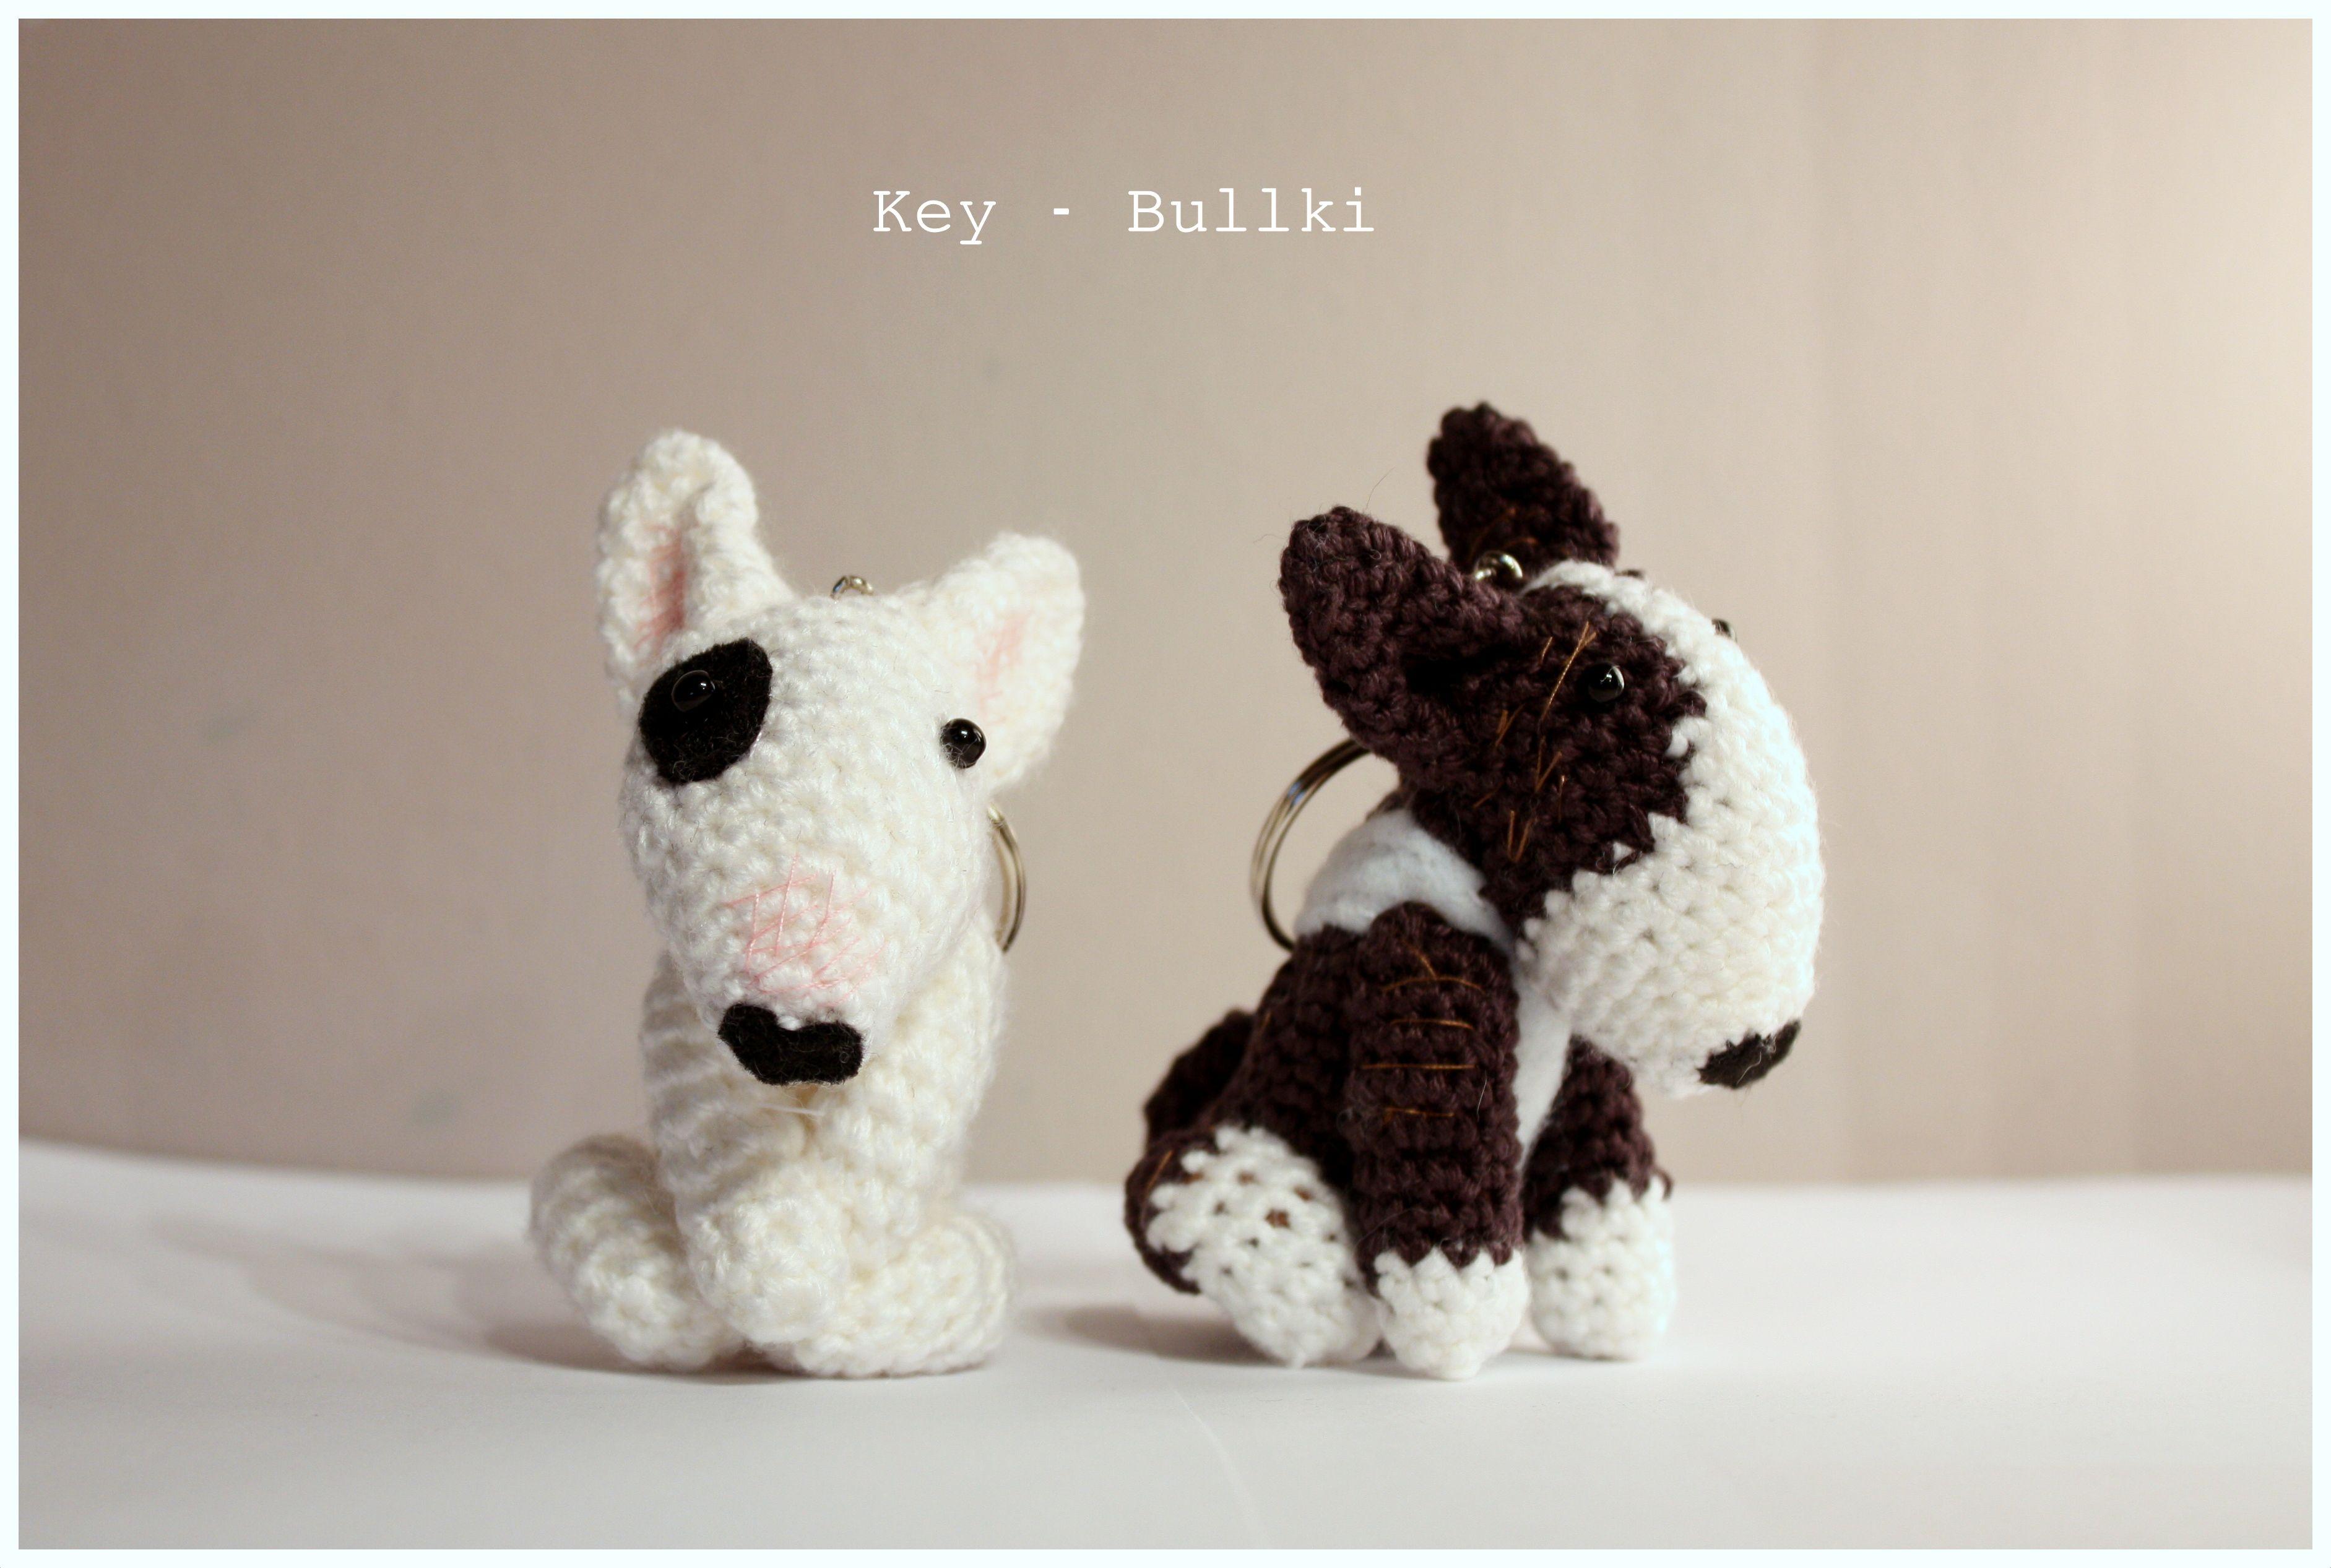 Woof the Dog - amigurumi pattern | DIY crochet toys | lilleliis | 2534x3766